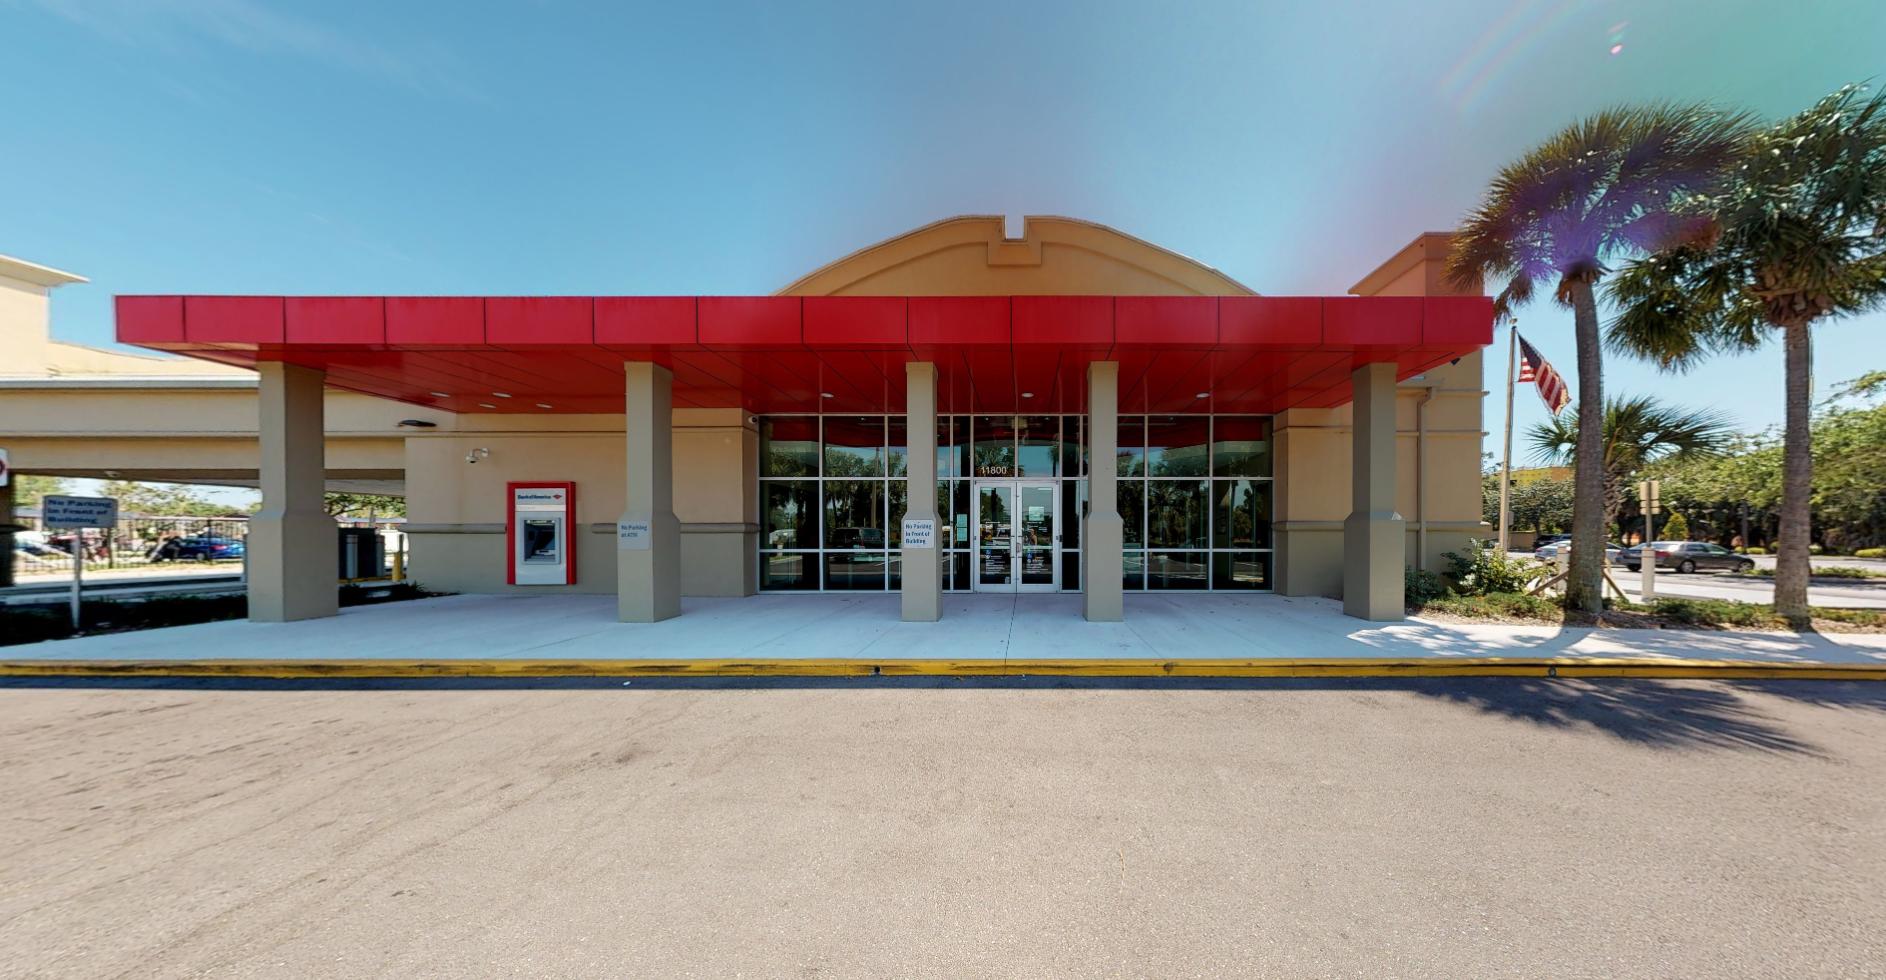 Bank of America financial center with drive-thru ATM   11800 Saradrienne Ln, Bonita Springs, FL 34135